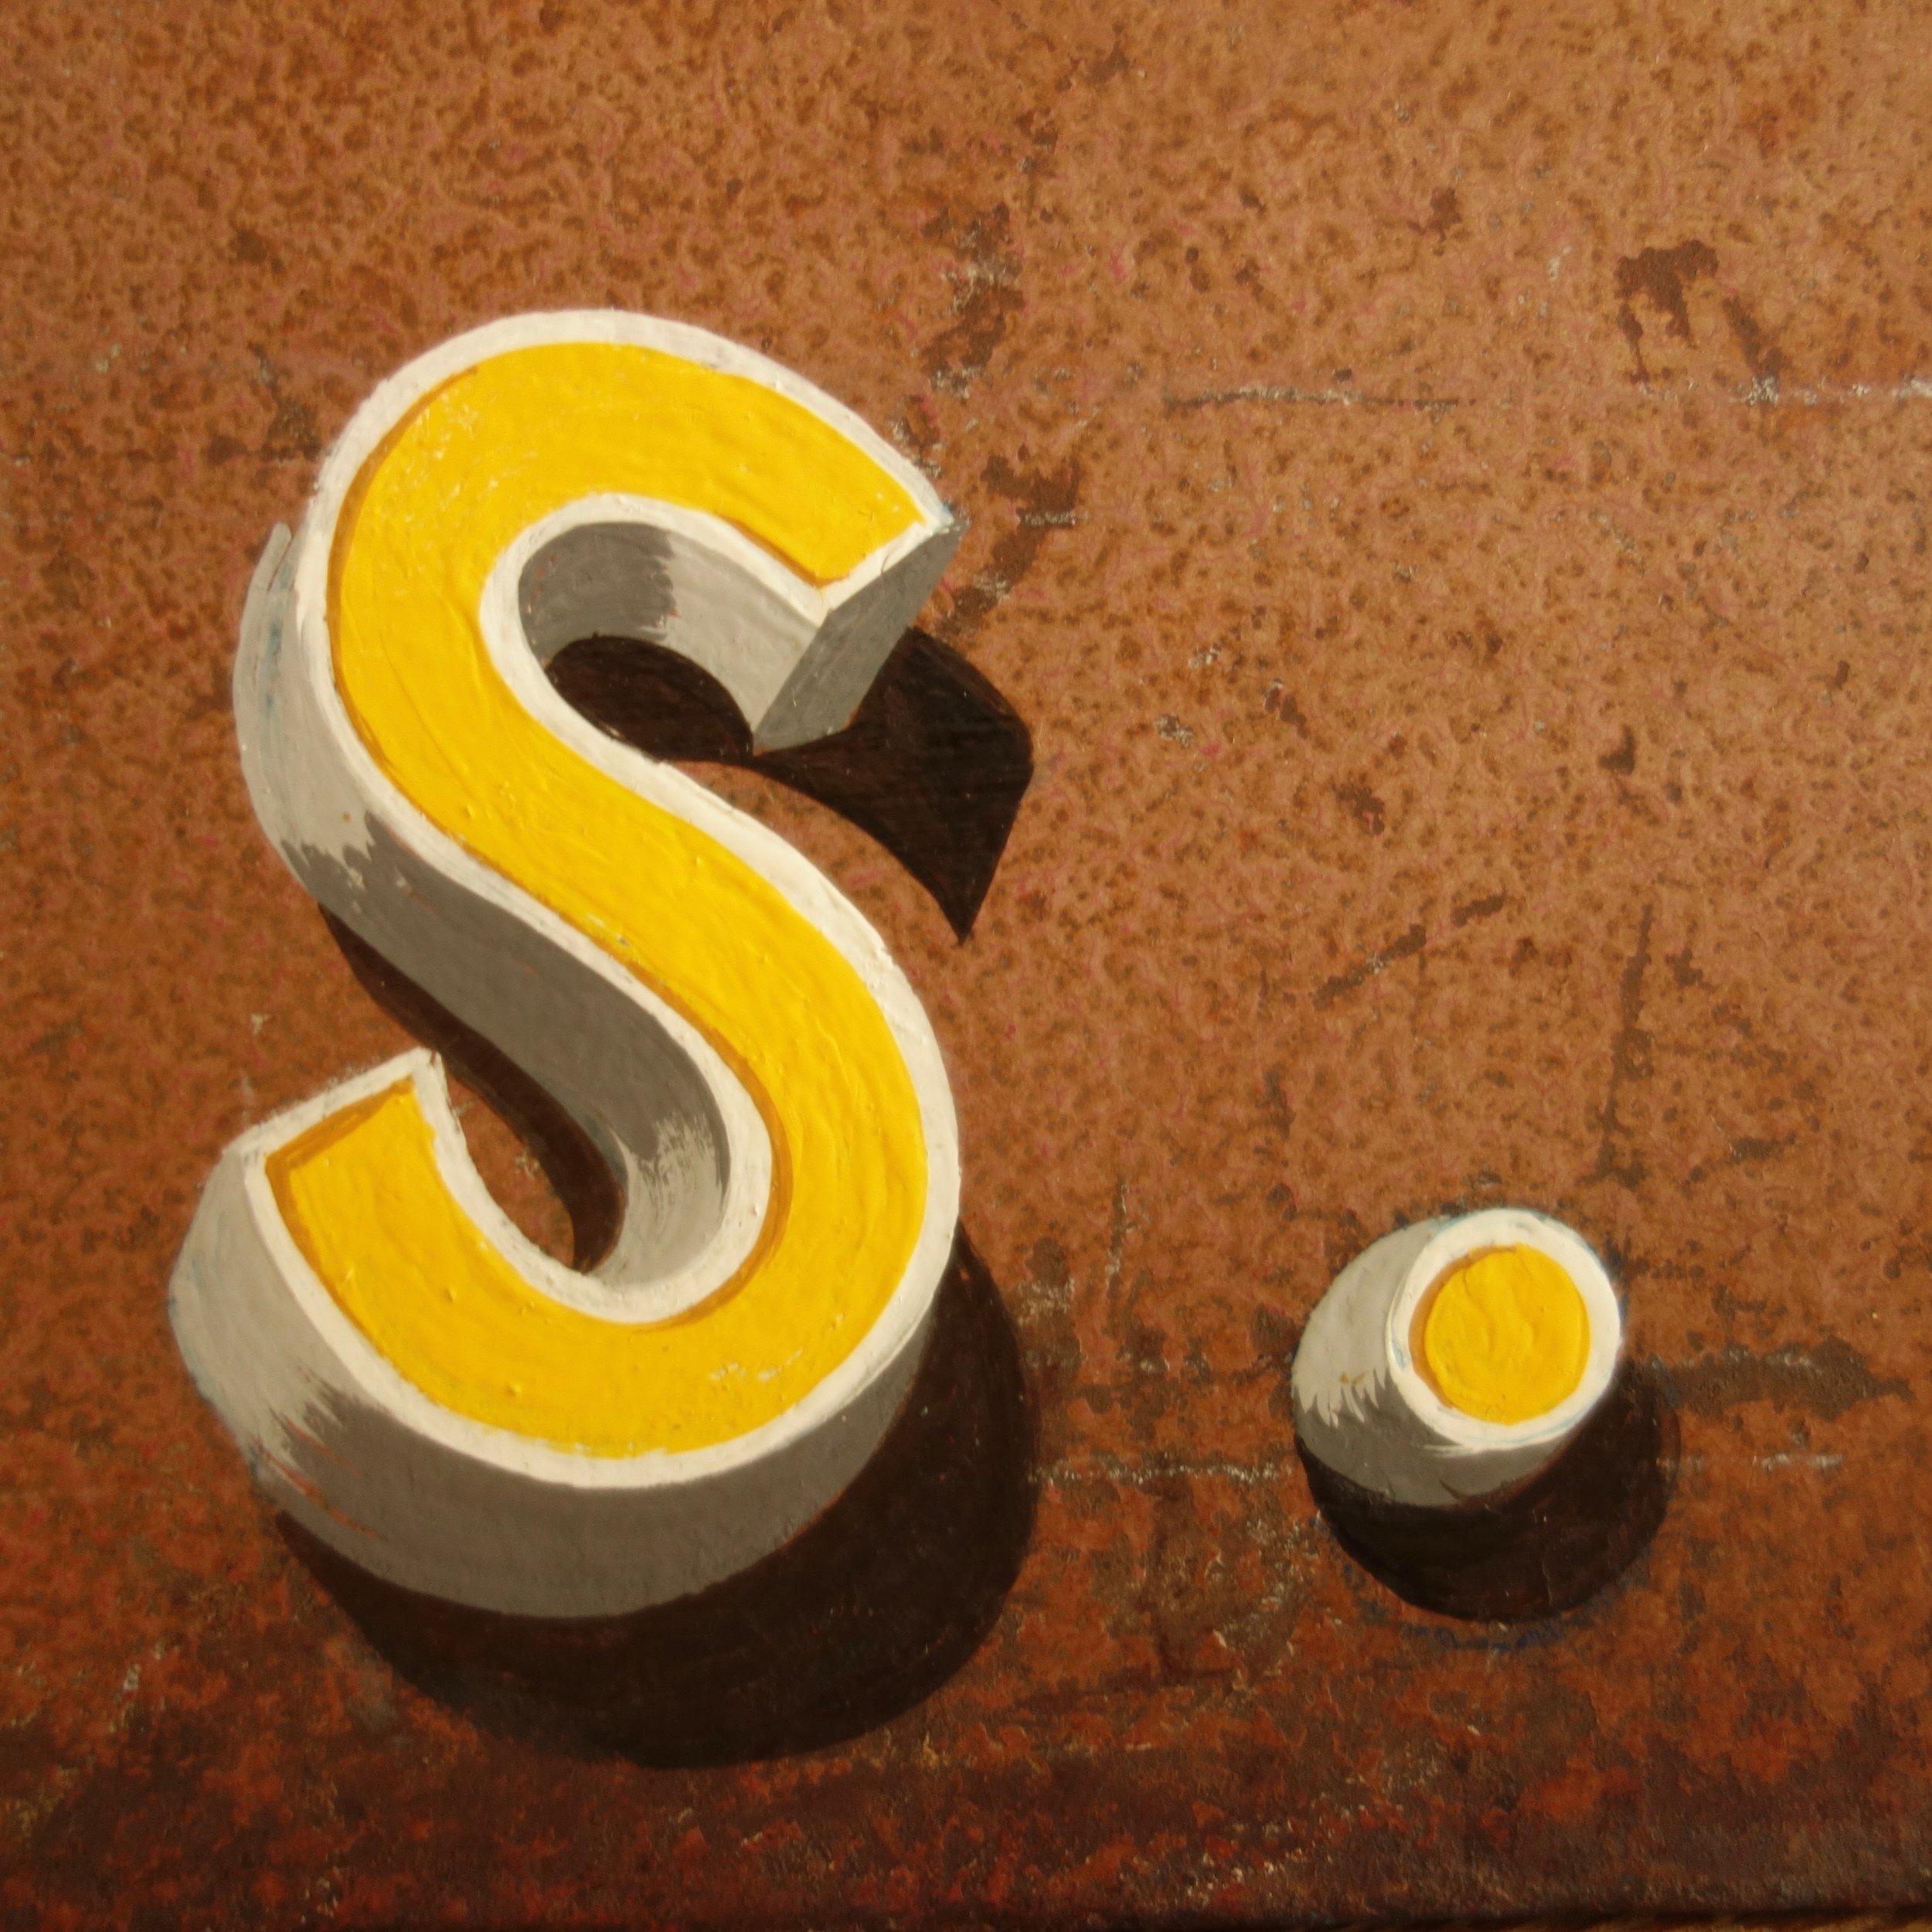 Signs_toolbox_lilS.jpg